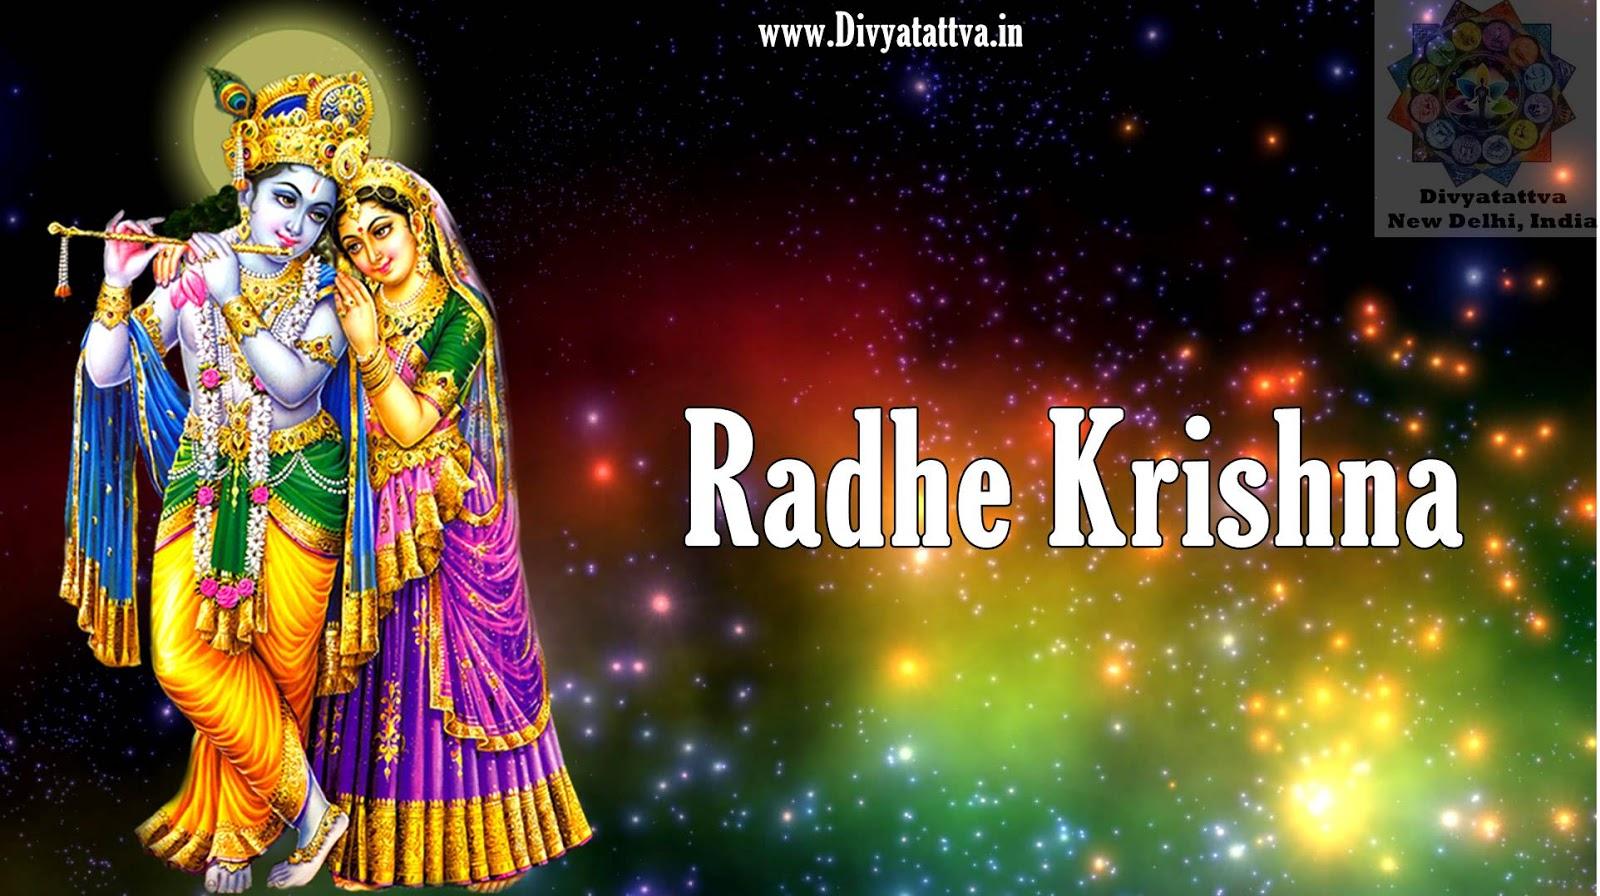 radha krishna images photos wallpaper background hndu indian gods www.divyatattva.in